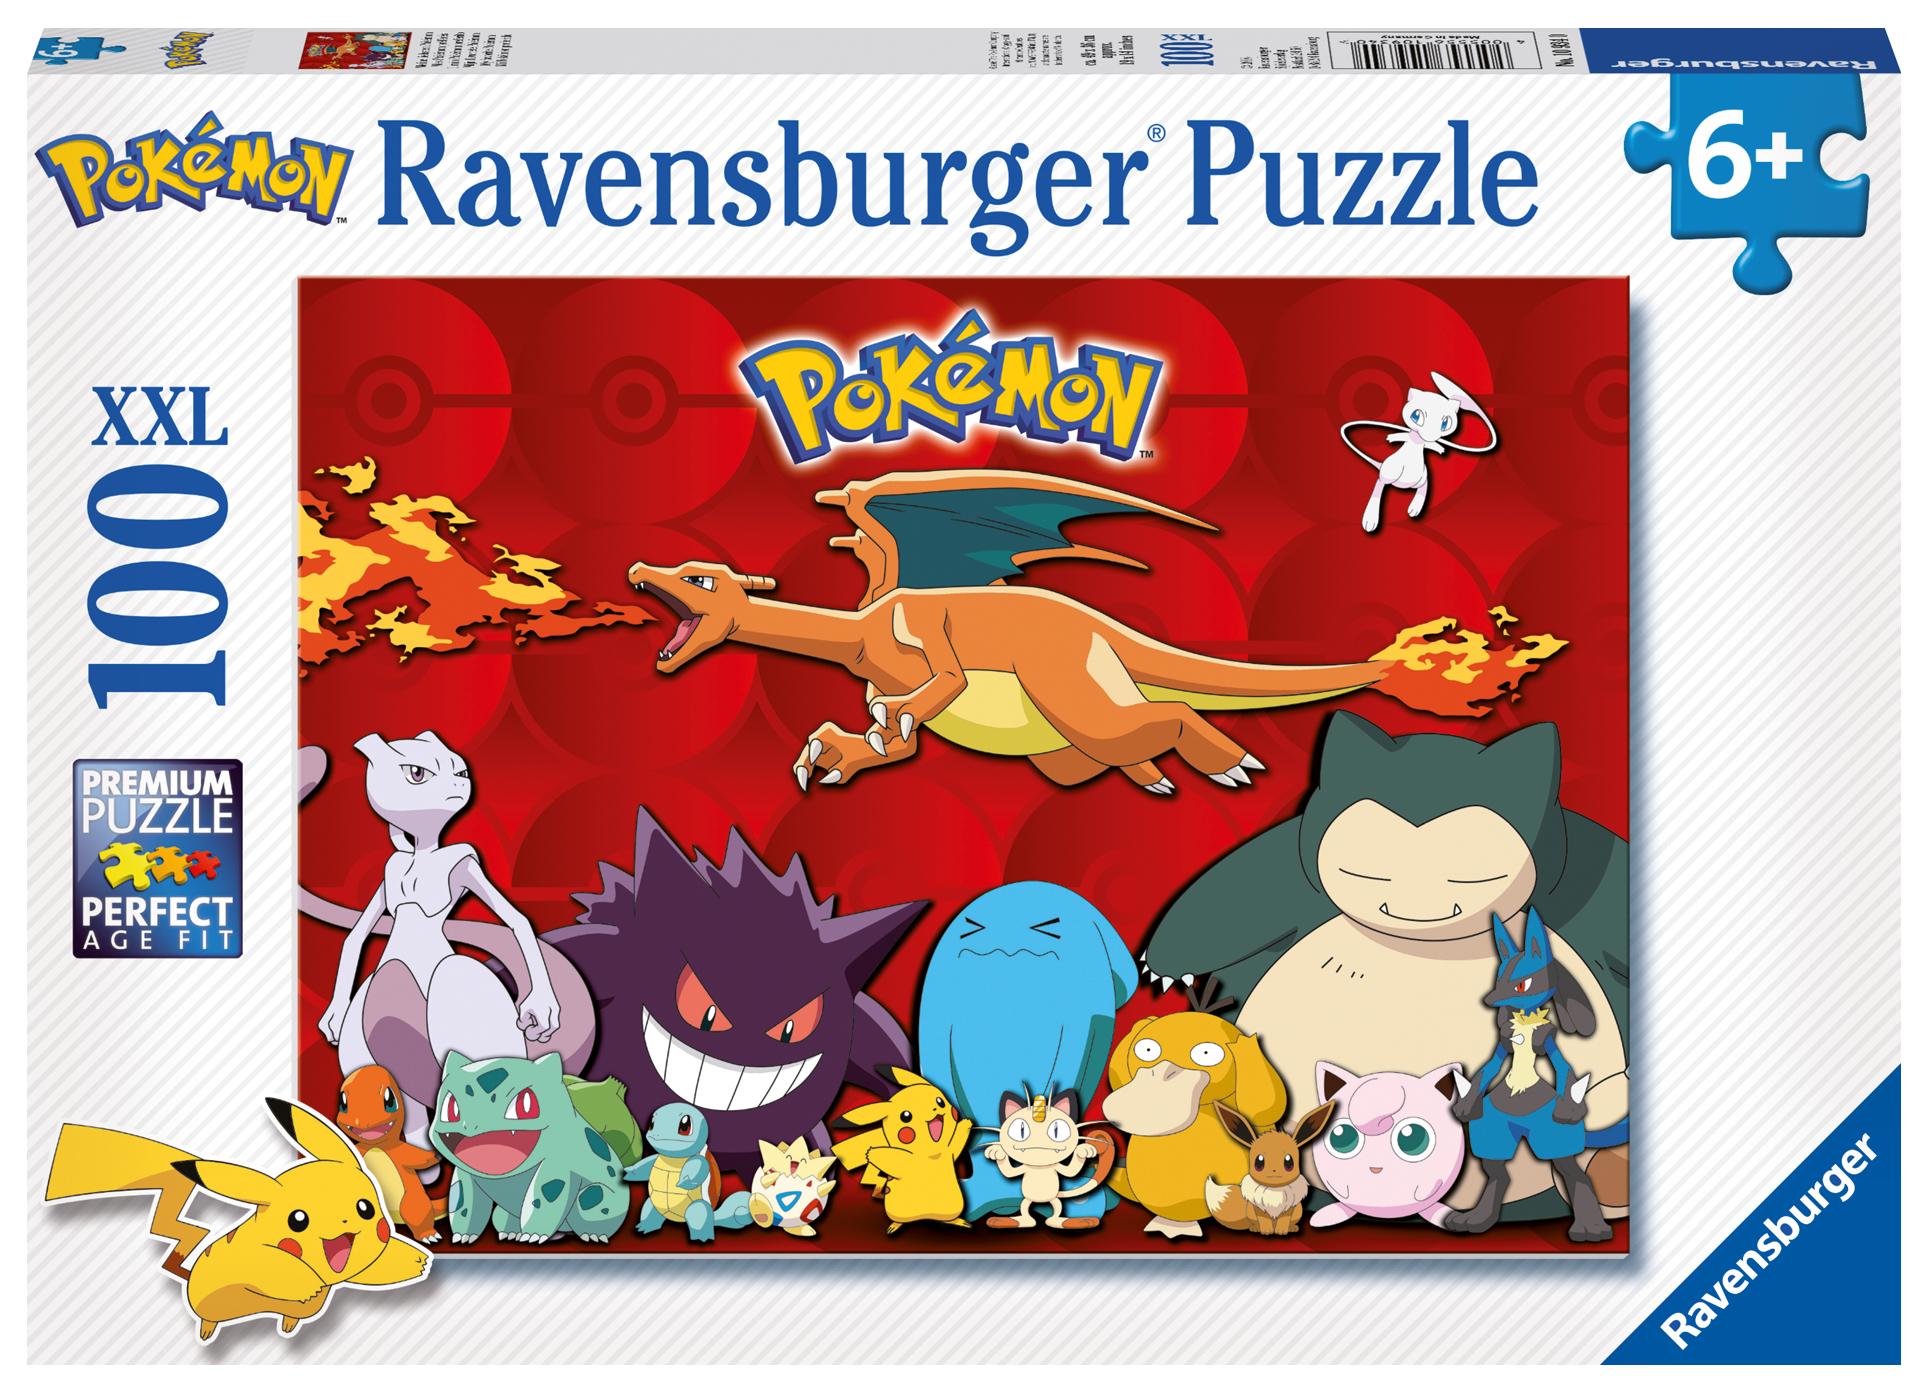 Uncategorized Pokemon Jigsaw Puzzle puzzle xxl pieces pokemon ravensburger 10934 100 jigsaw pokemon